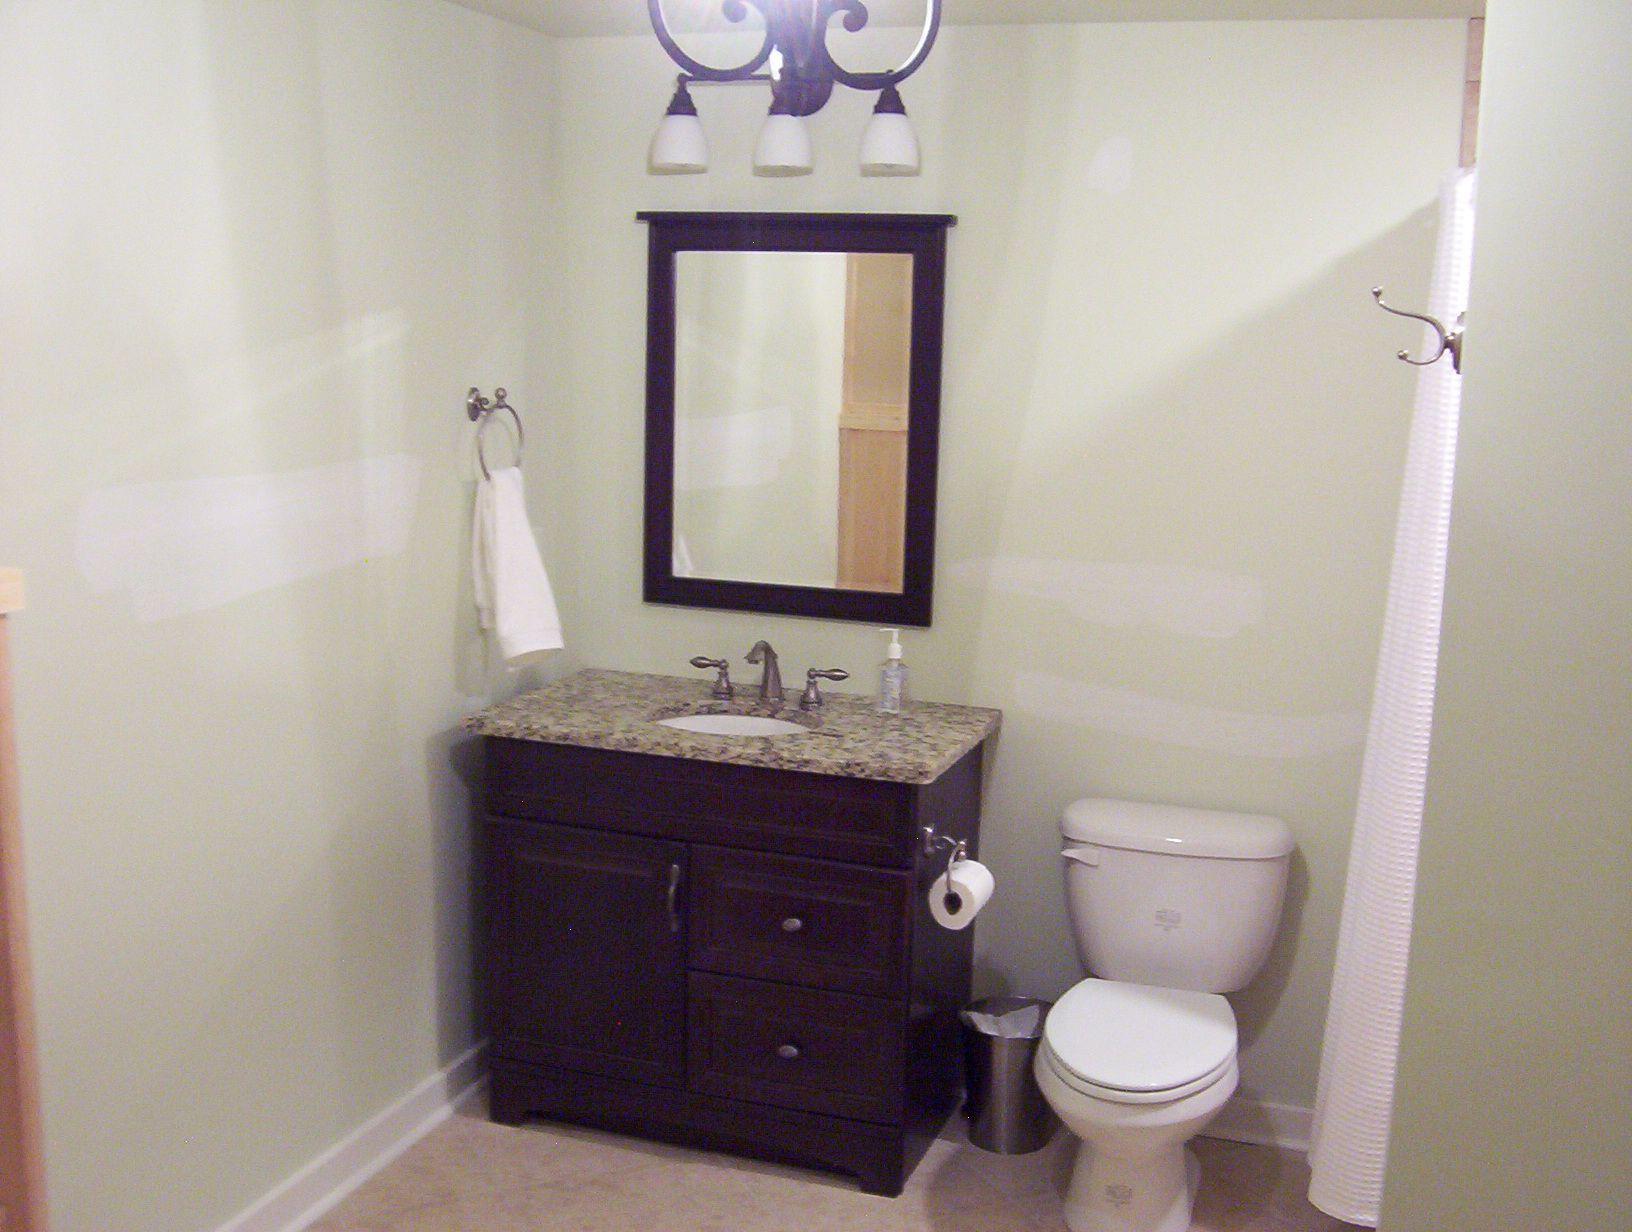 Bon Simple Bathrooms. Small Bathroom Tiles Ideas Recent List   Modern Tile  Designs For Wall And